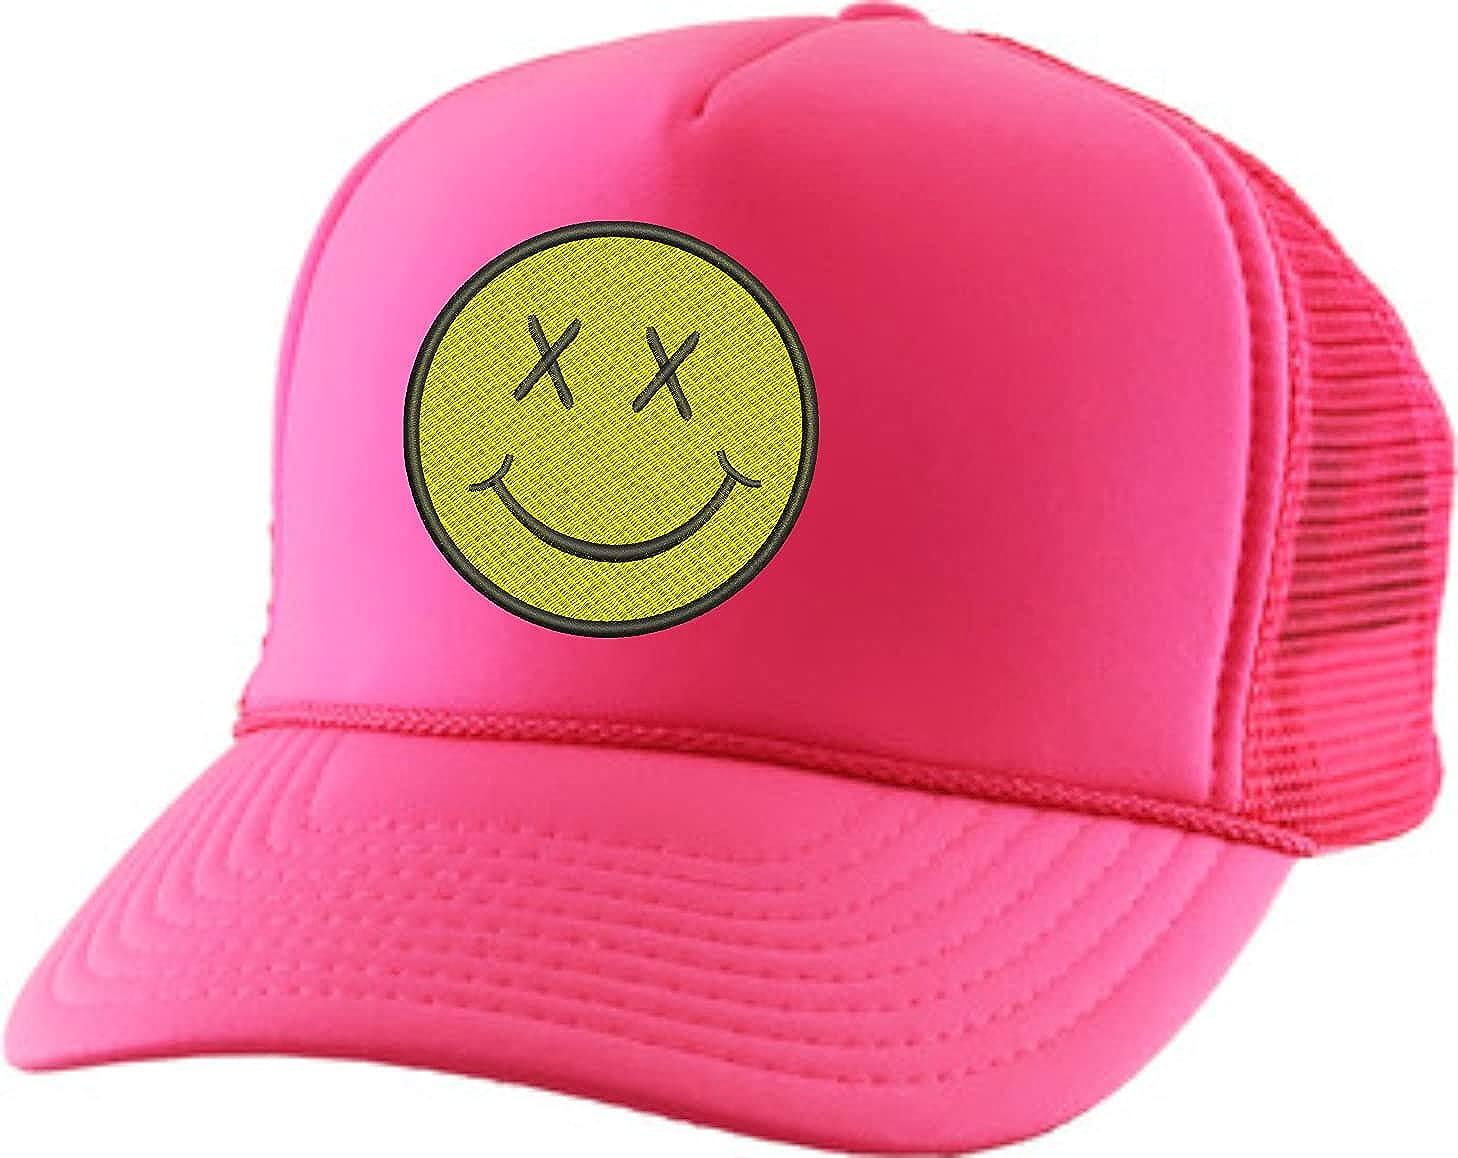 ALLNTRENDS Adult Trucker Hat Smiley Face Embroidered Baseball Cap Adjustable Snapback